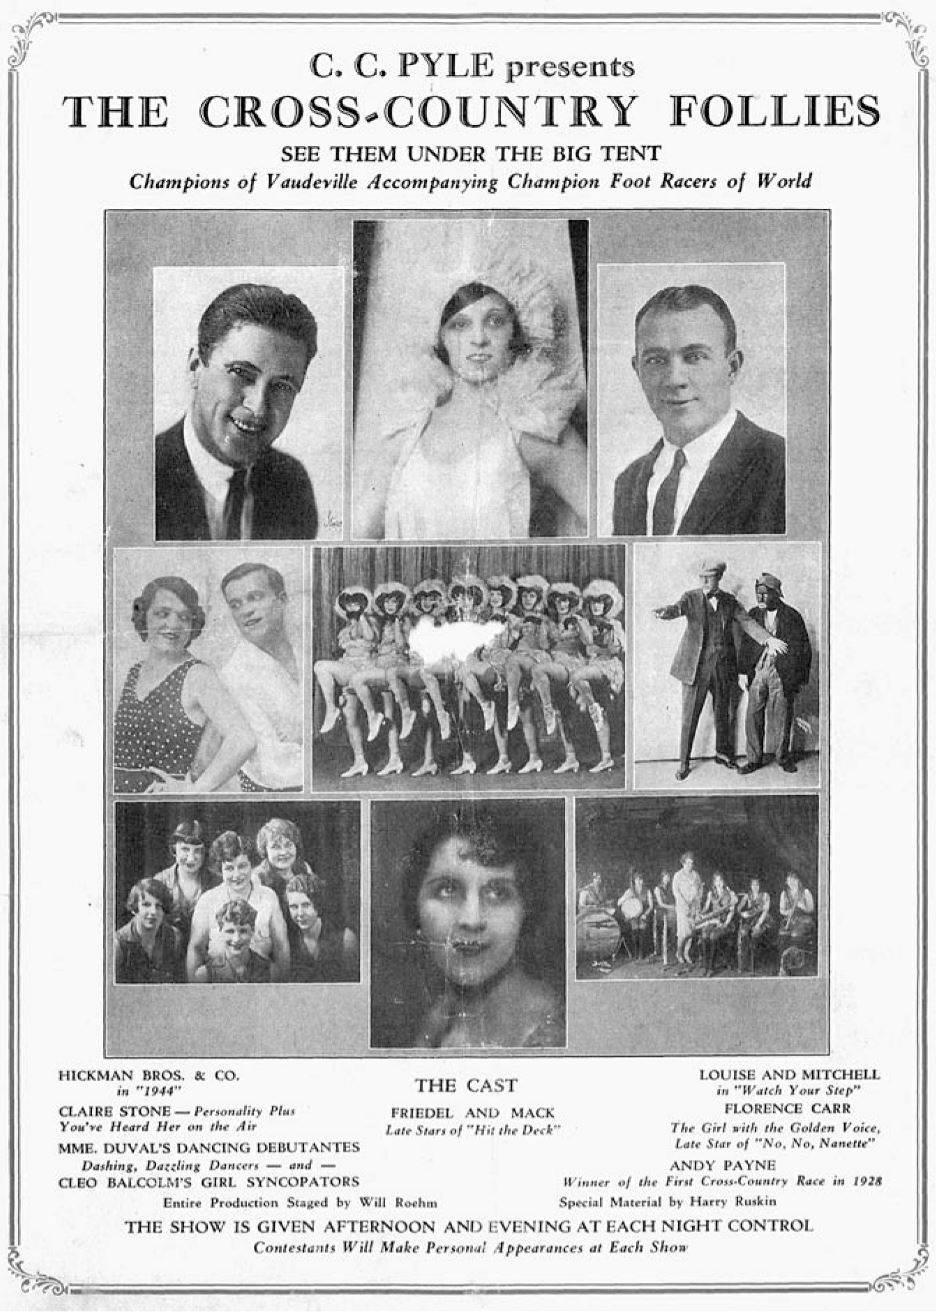 32: Johnny Salo – 1929 Bunion Derby Ultrarunning History podcast